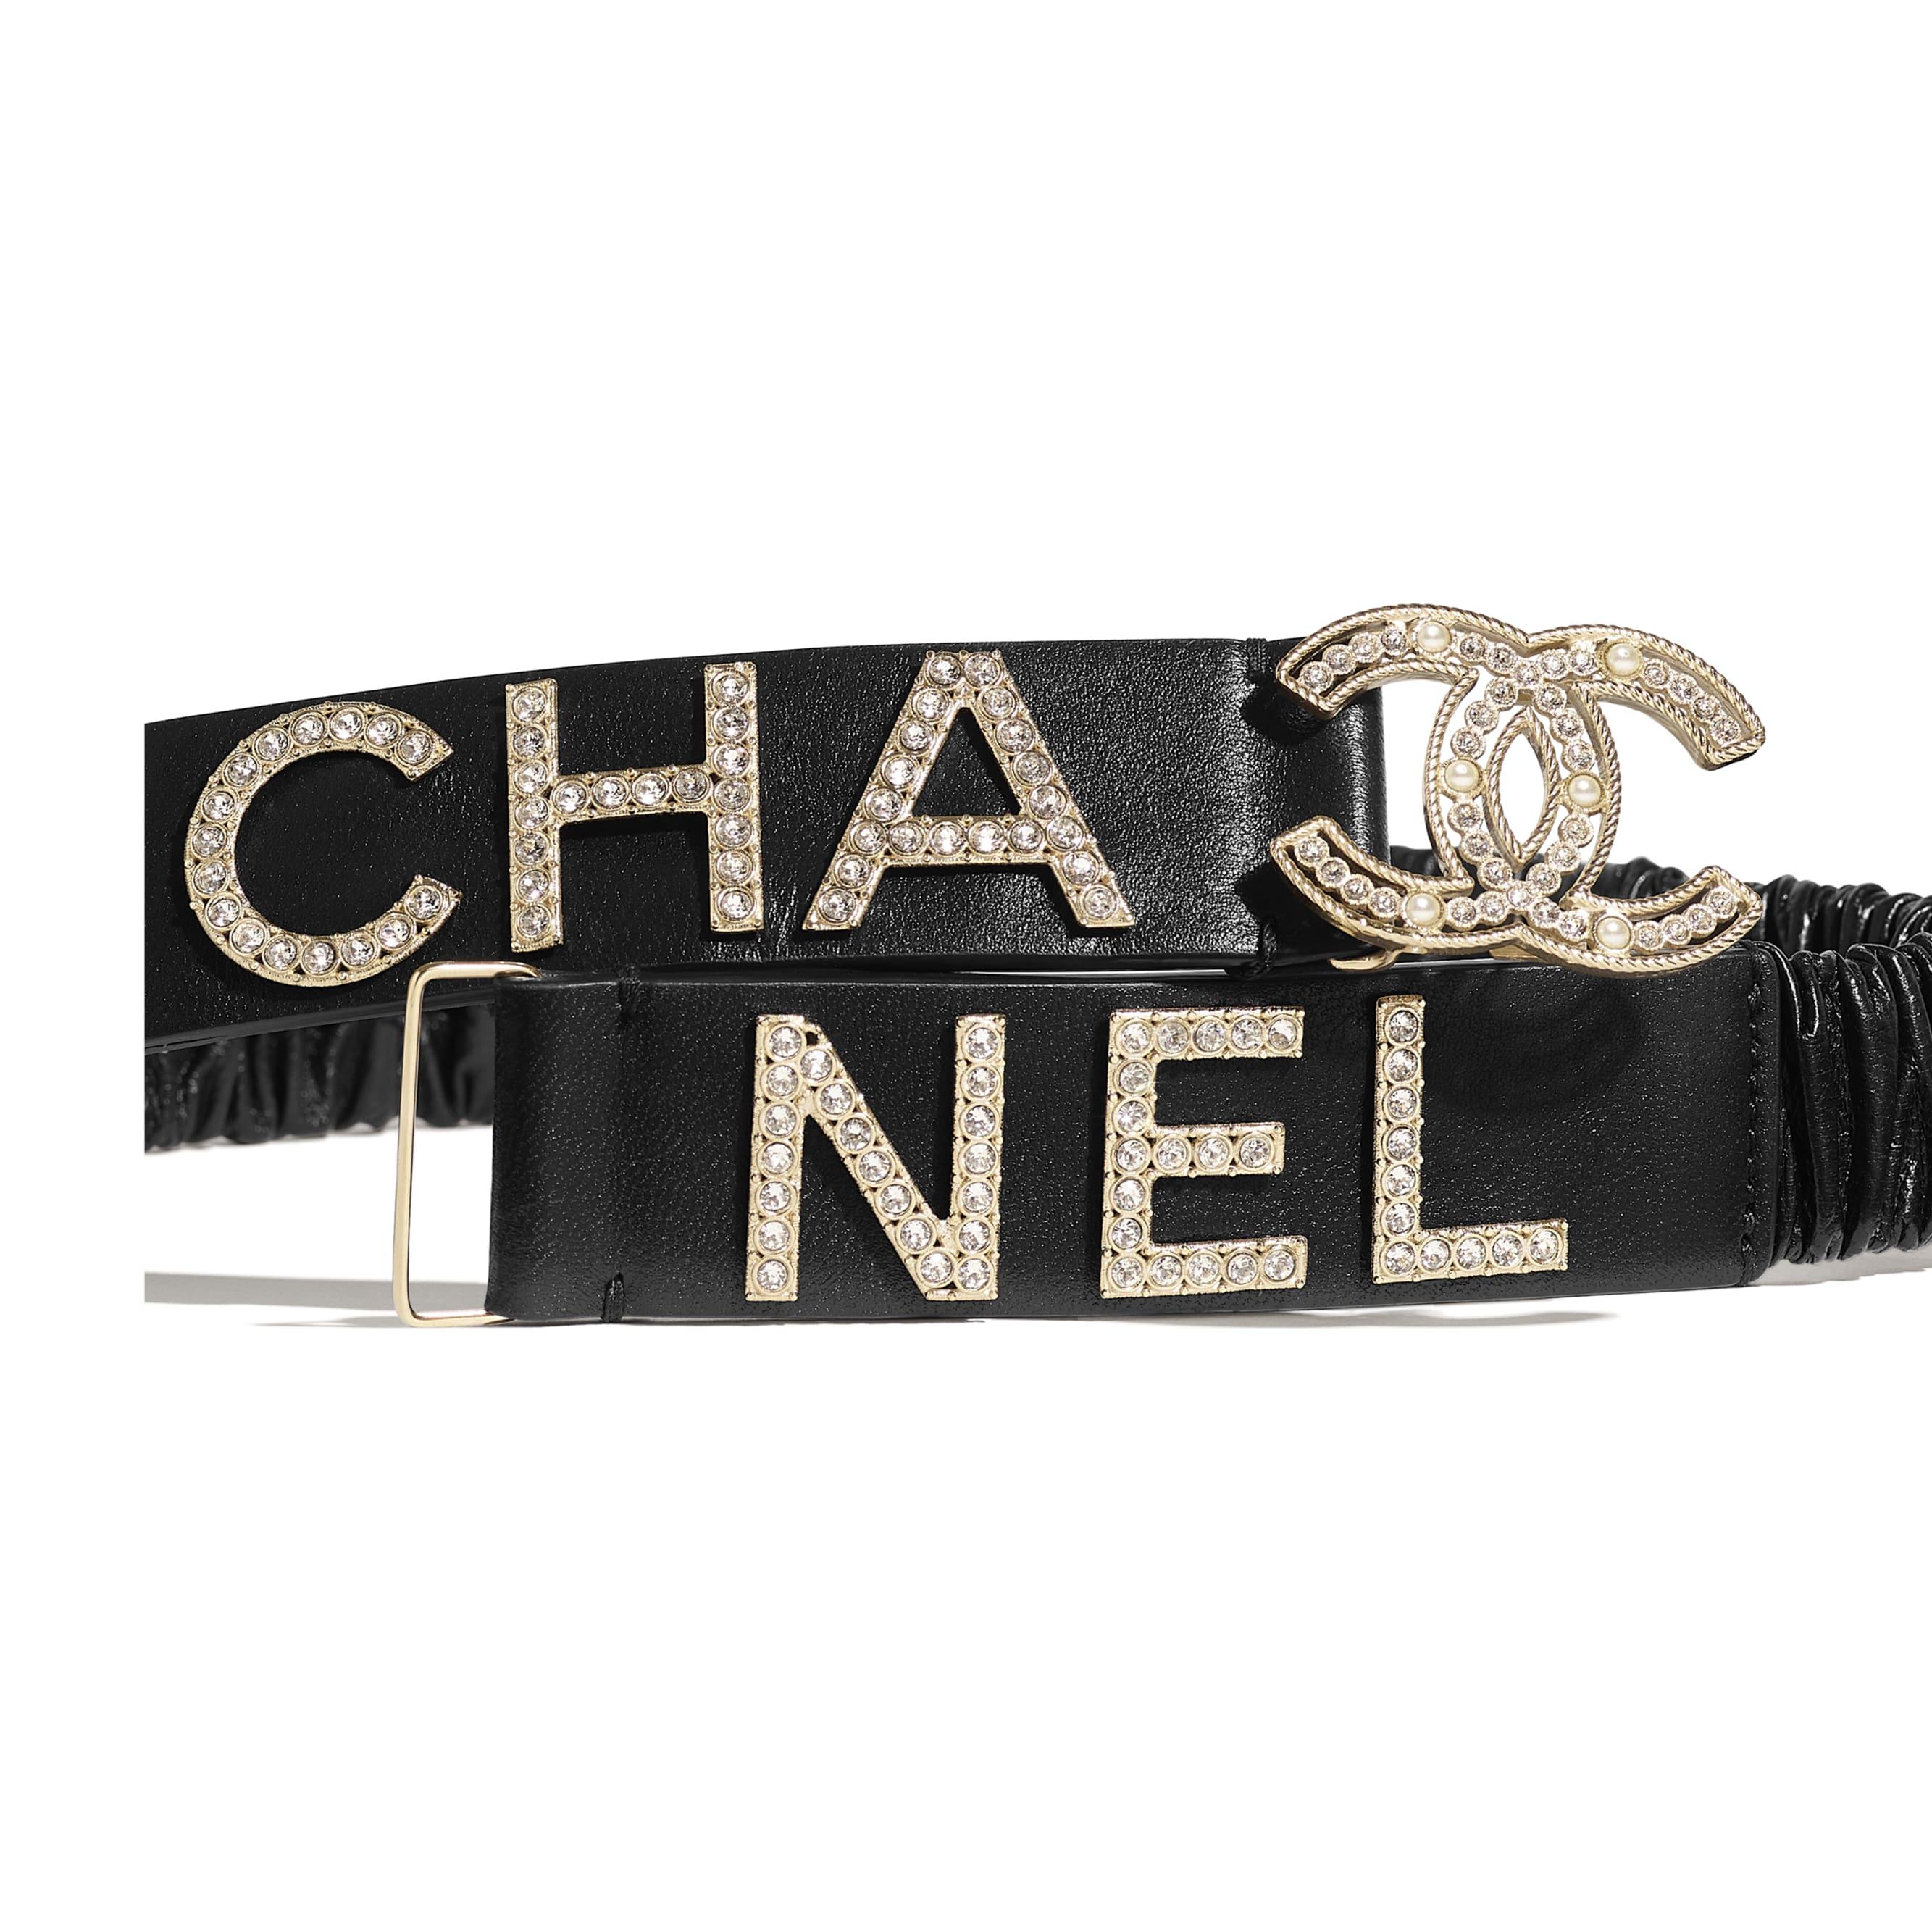 Belt - Black - Lambskin, Gold-Tone Metal, Strass & Glass - Alternative view - see standard sized version